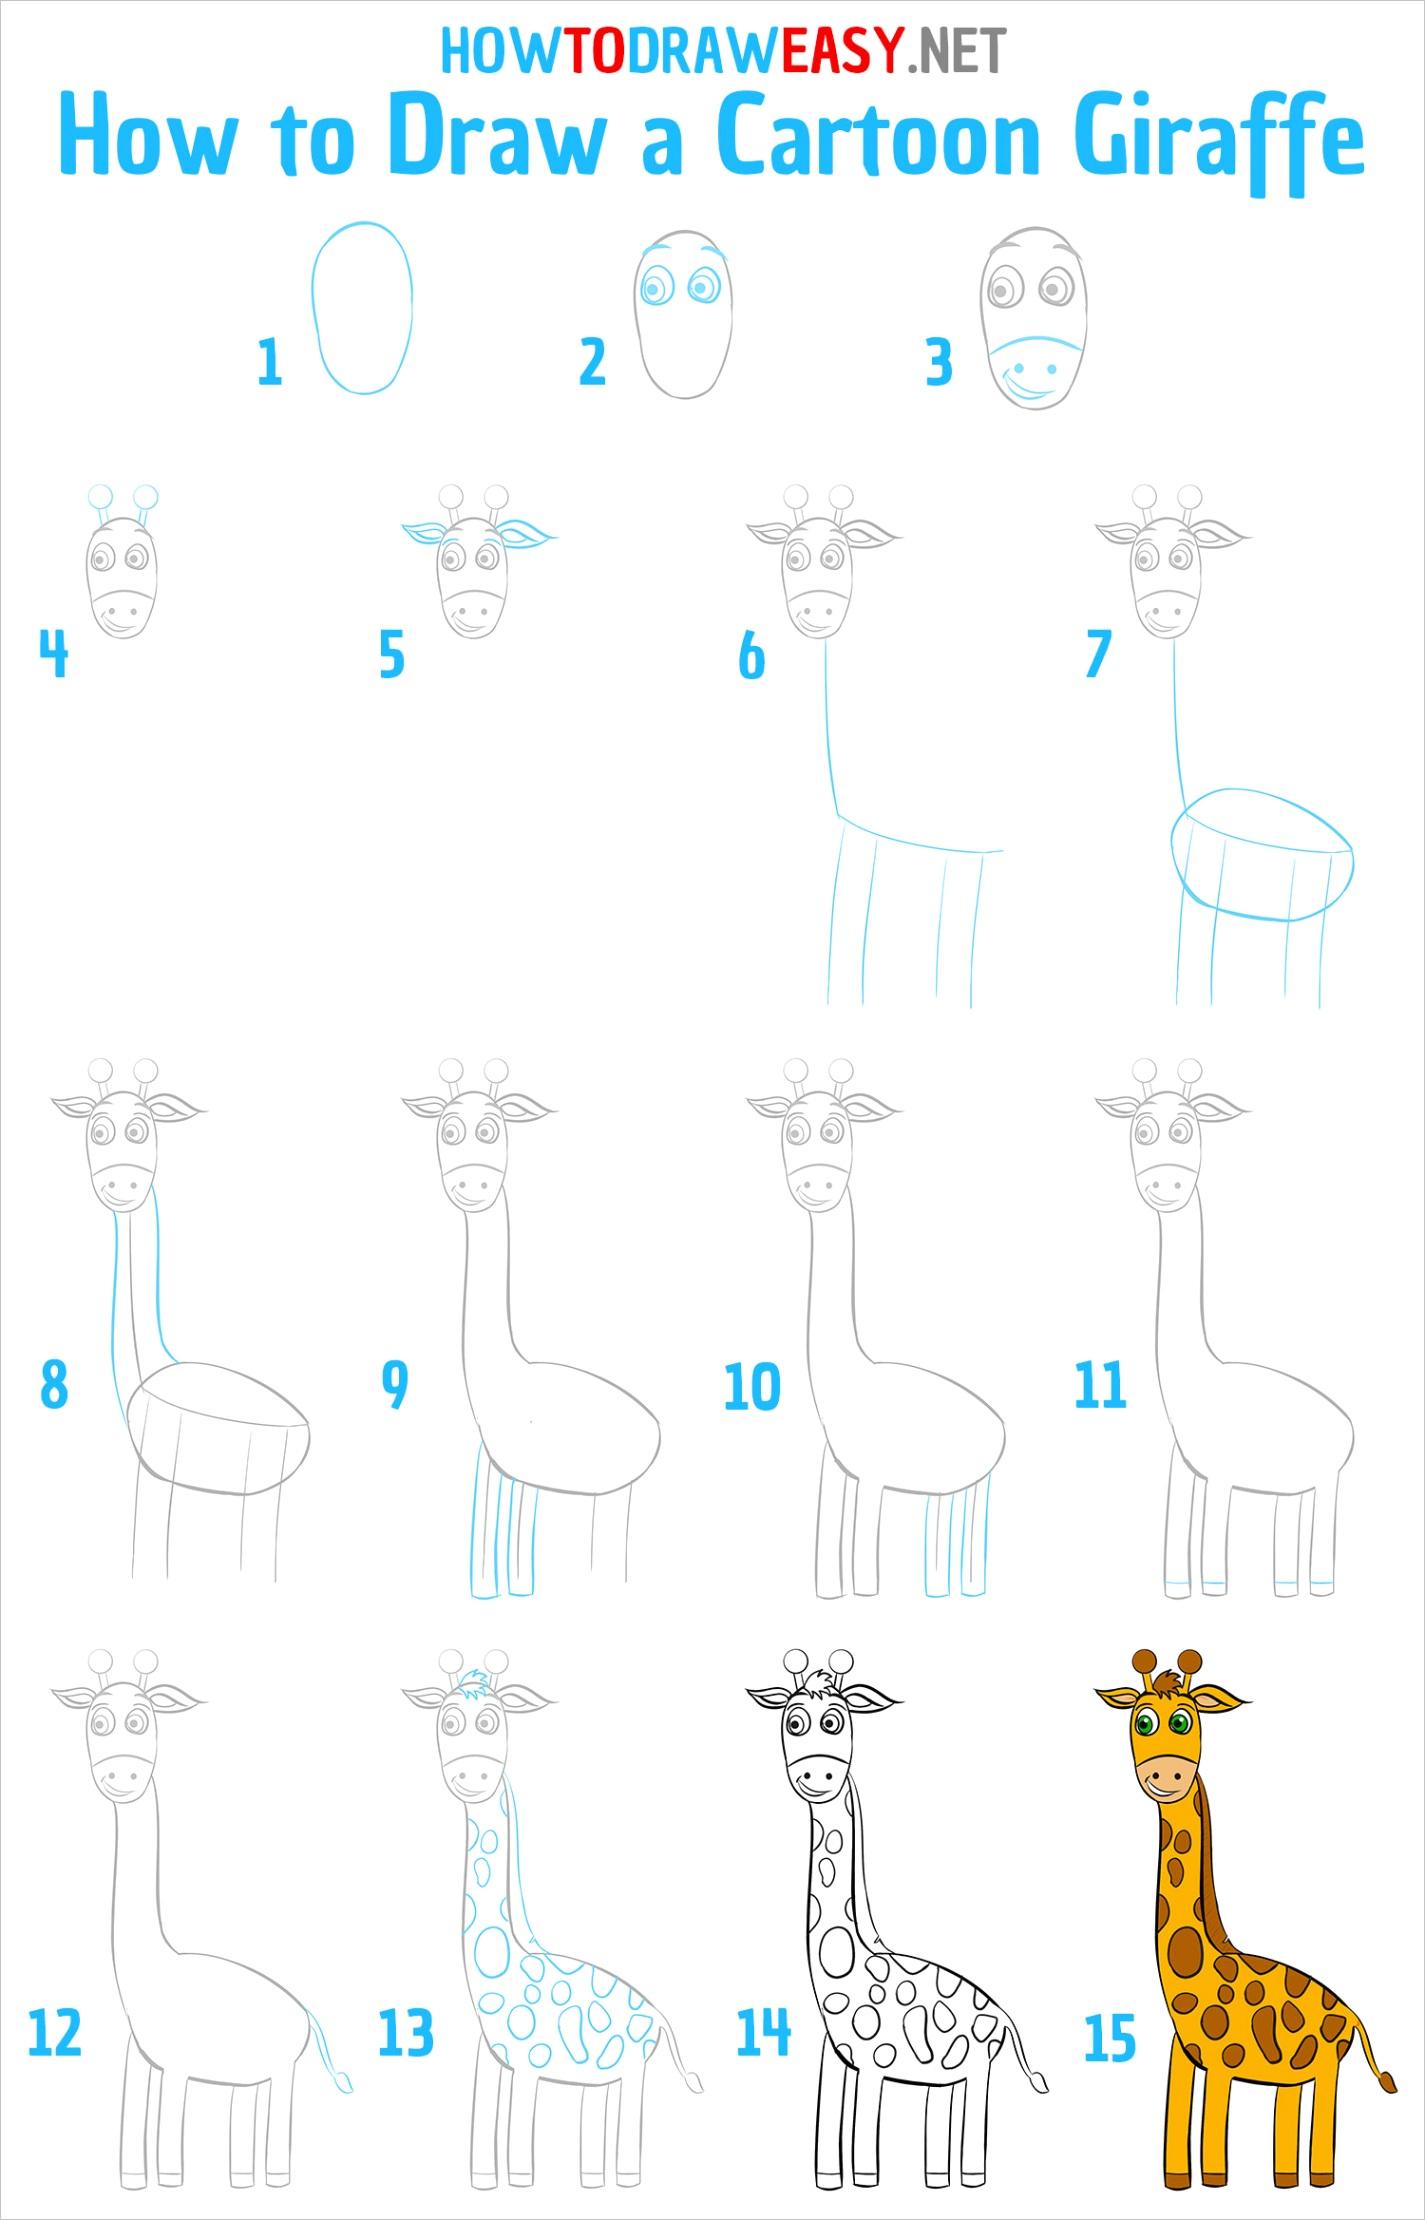 how to draw a cartoon giraffe